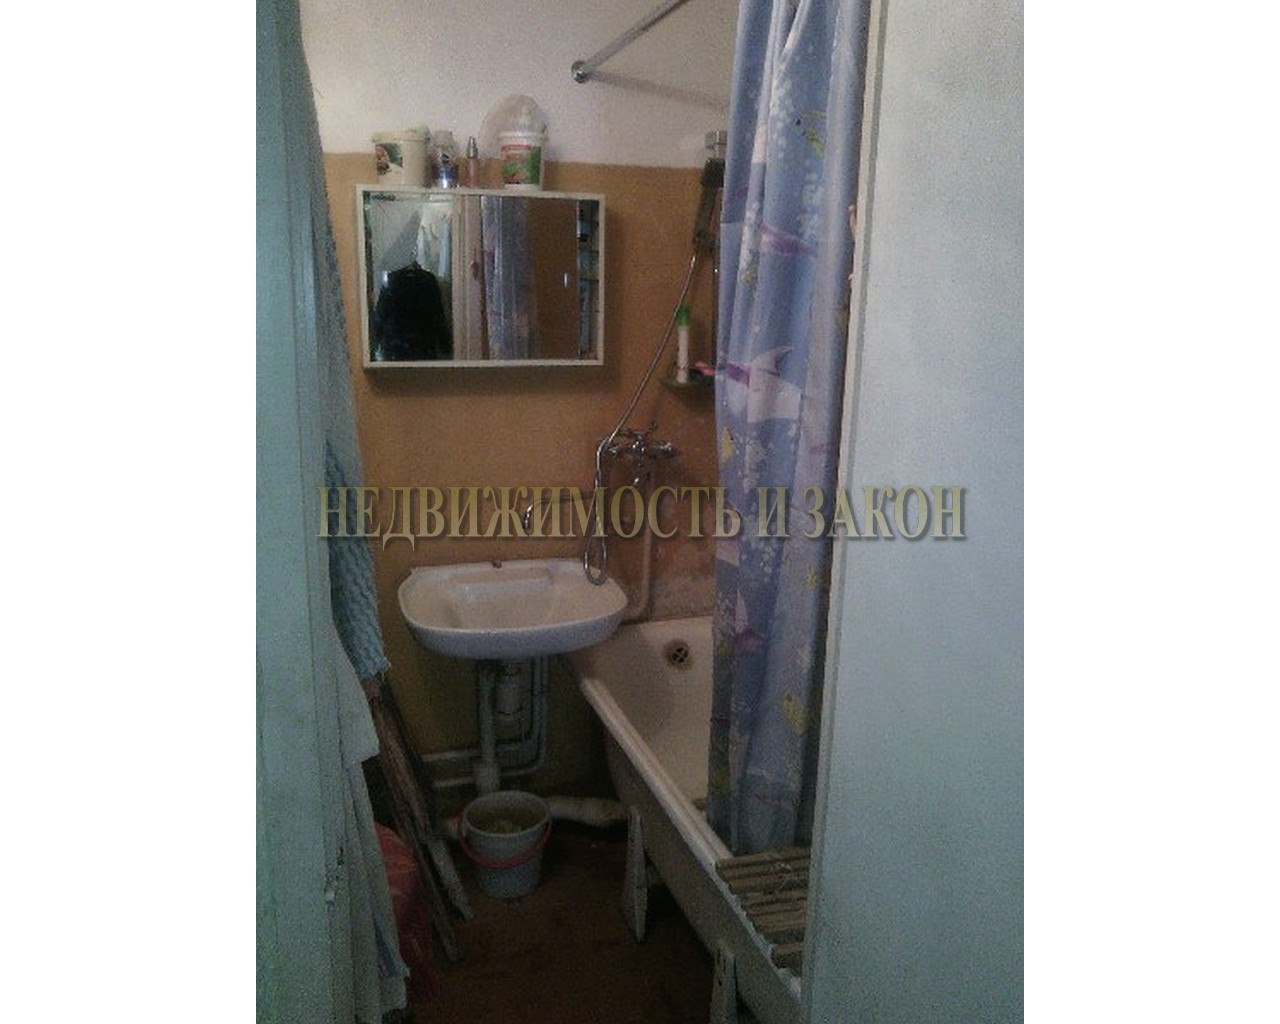 Продажа квартир: 2-комнатная квартира, Сыктывкар, Петрозаводская ул., 21влдкстр, фото 1